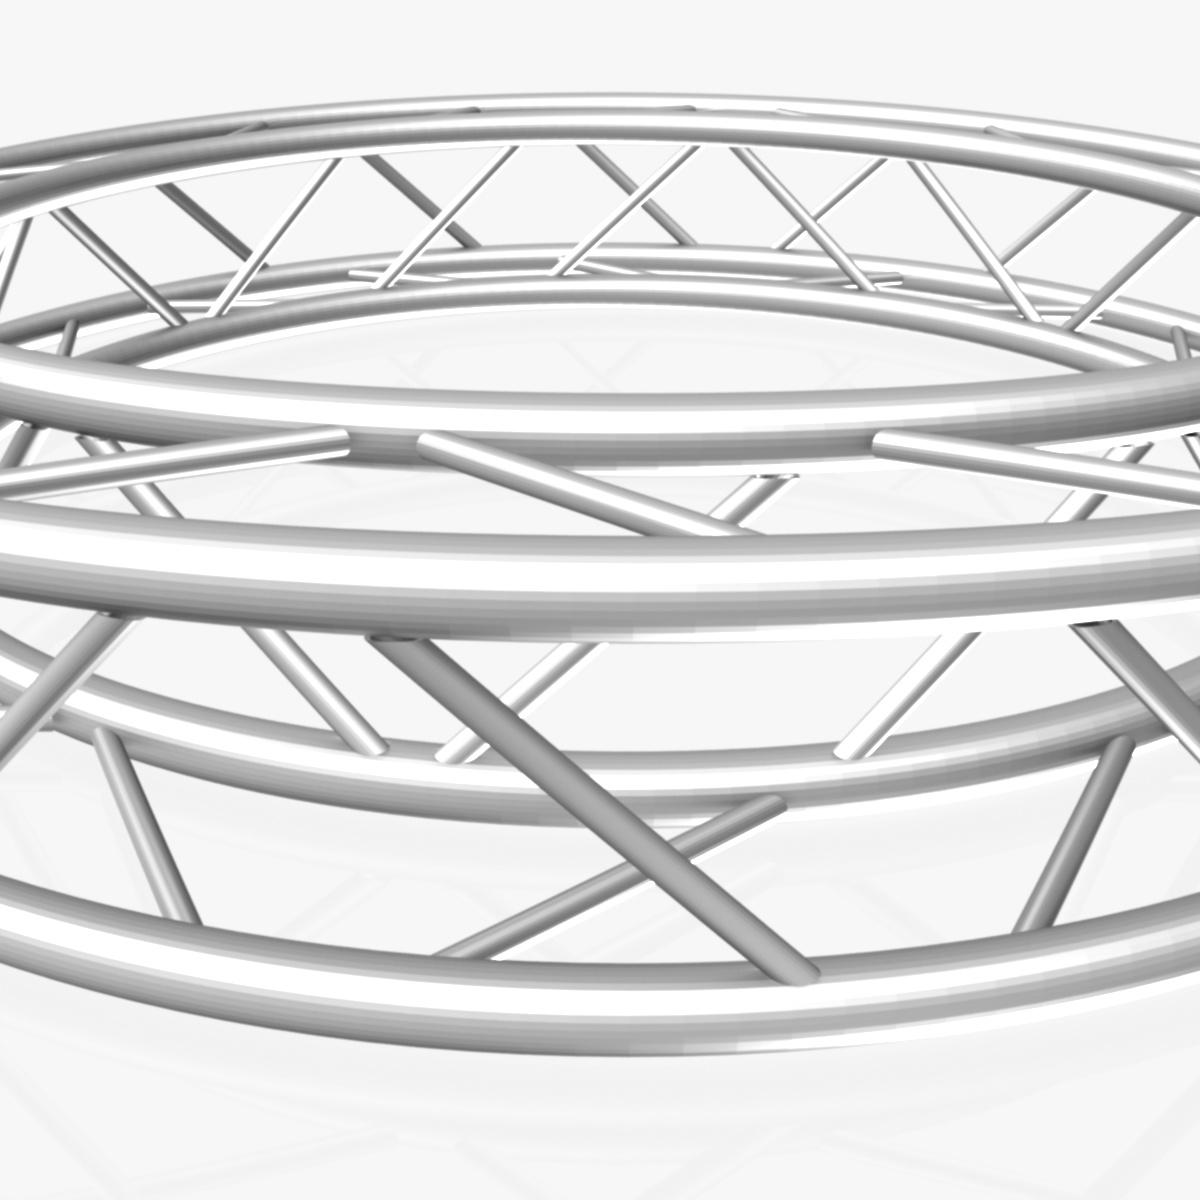 дугуй дөрвөлжин Дотоод (бүрэн диаметр 200cm) 3d загвар 3ds max dxf fbx c4d dae obj 252360